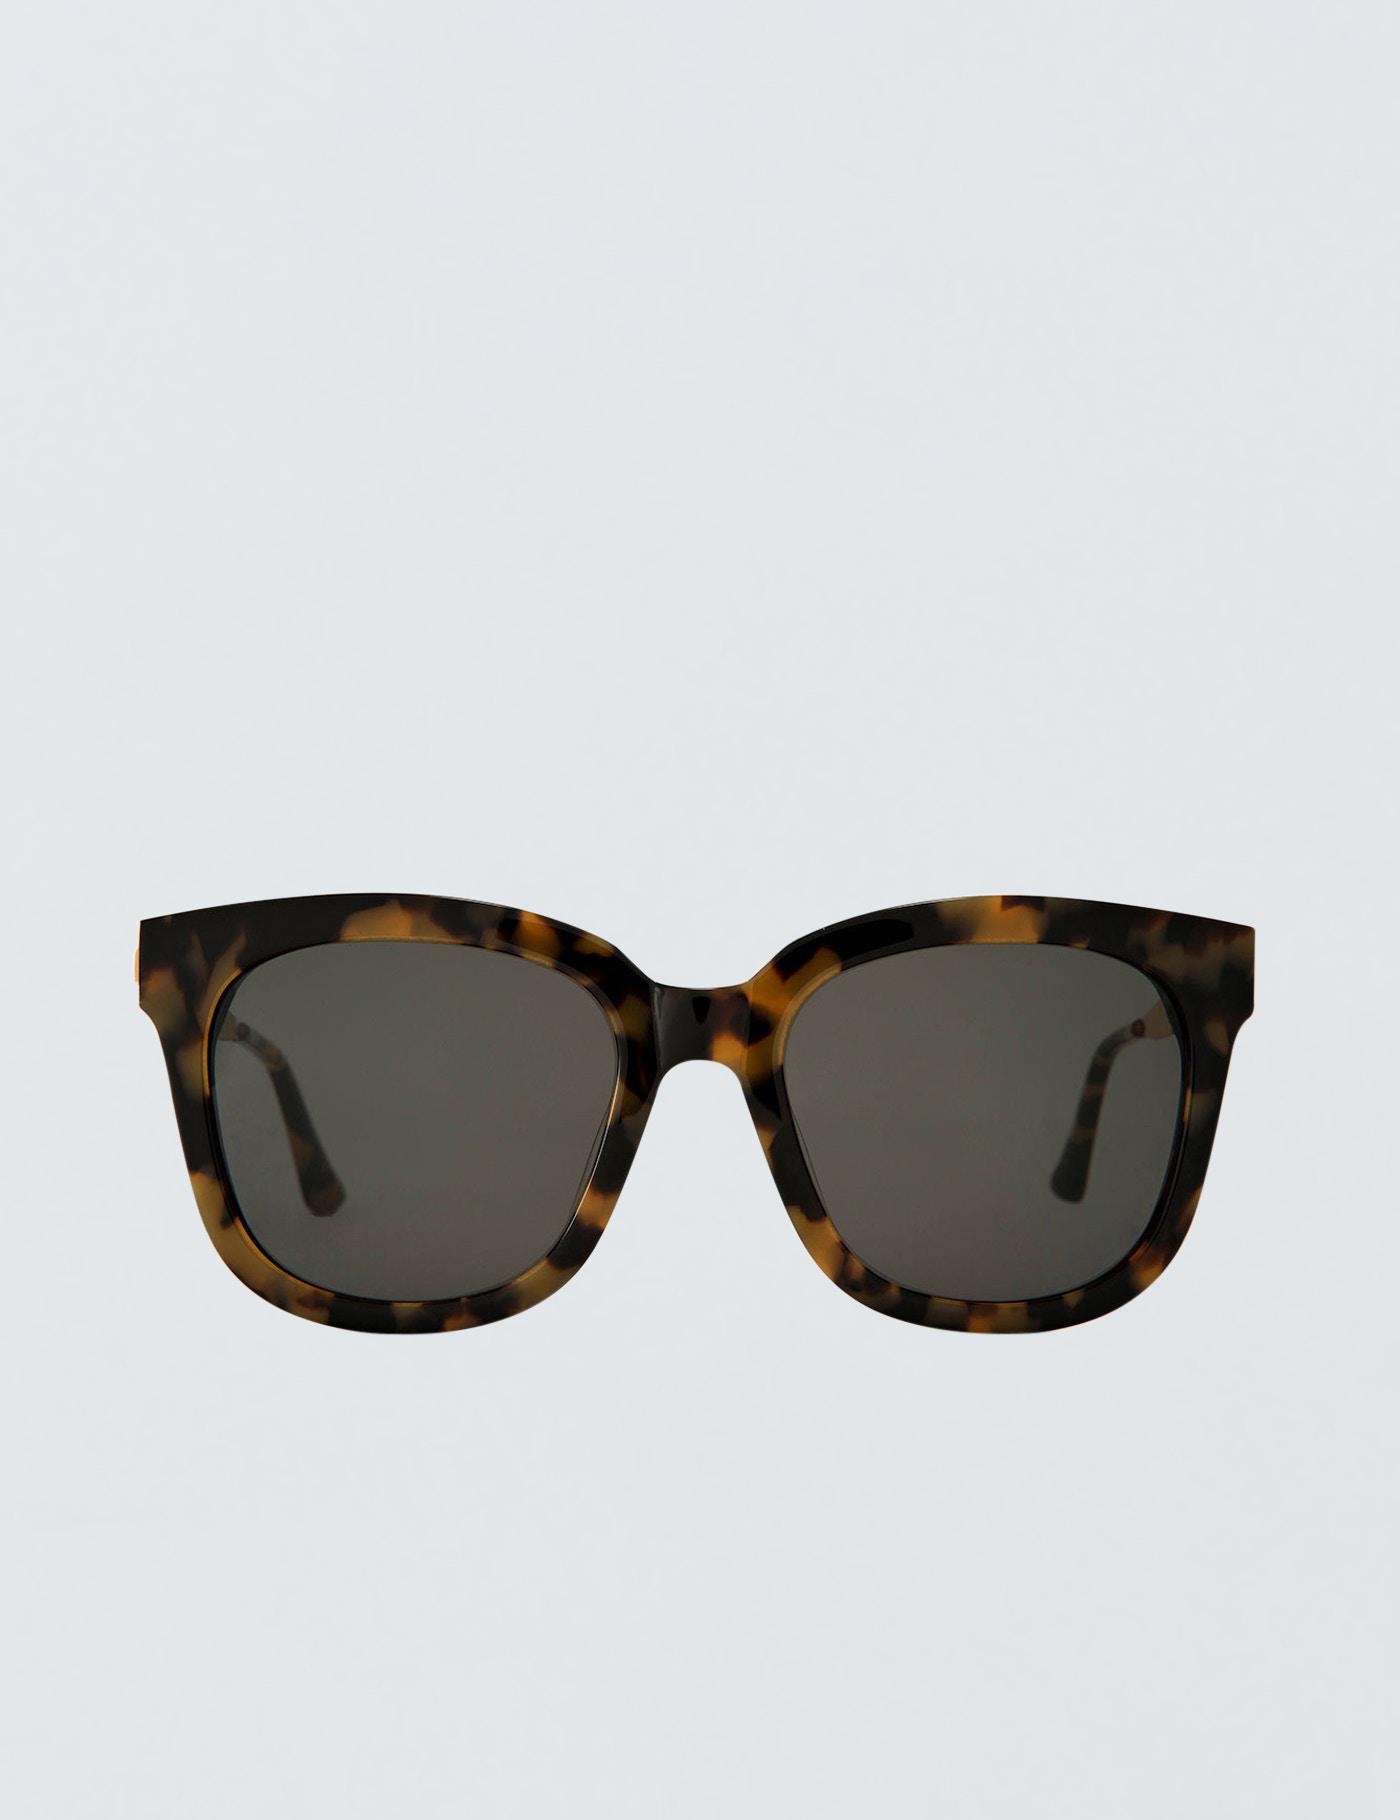 5fbdda8d27b0 Lyst - Gentle Monster Absente Sunglasses